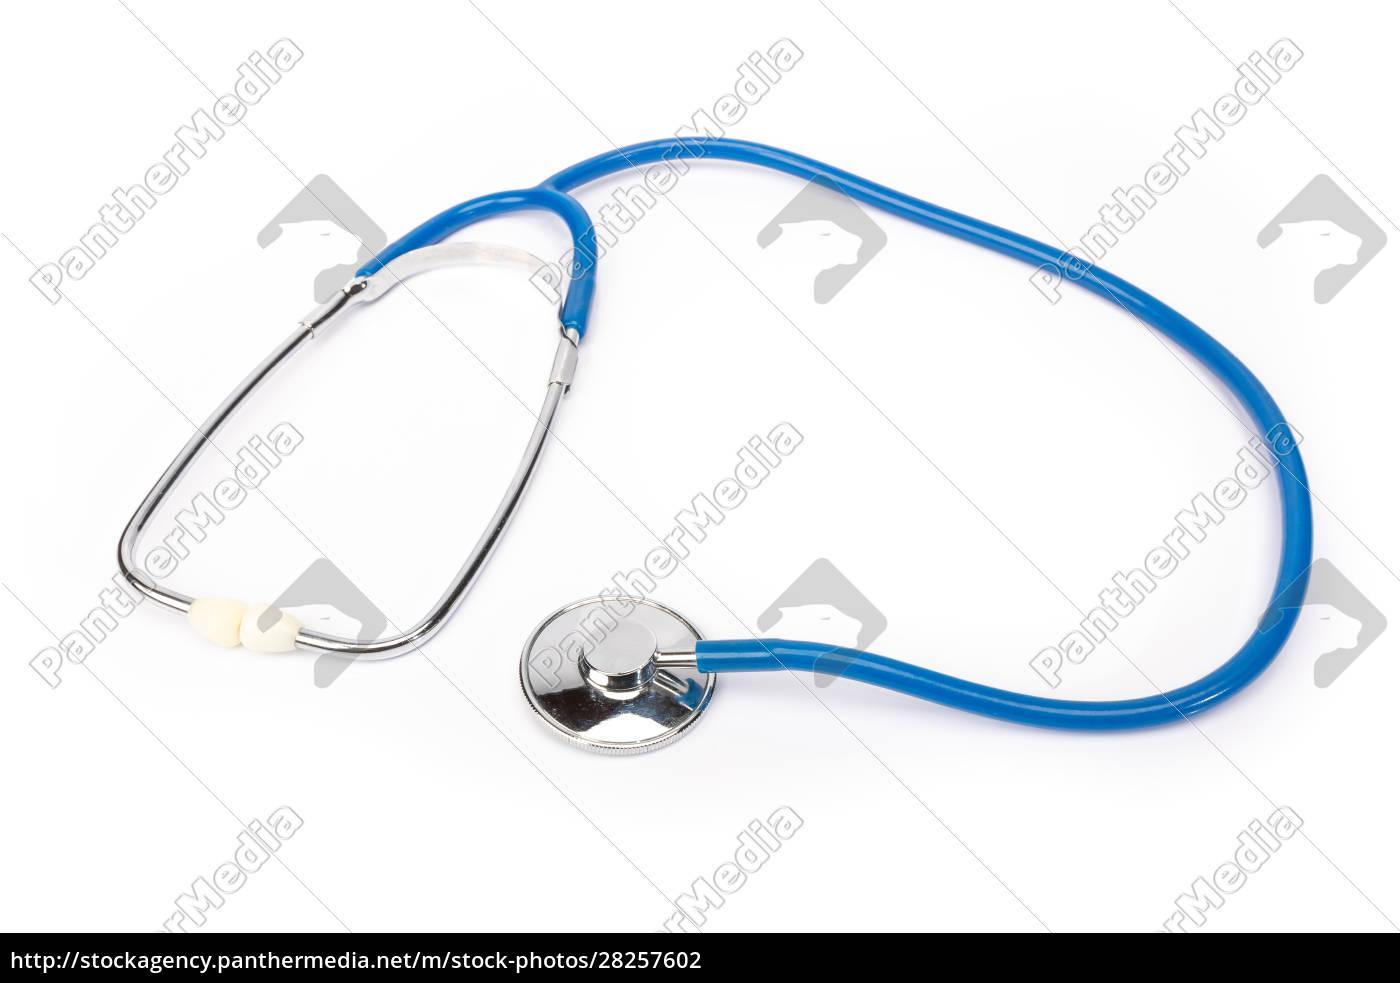 close, up, of, stethoscope, on, white - 28257602